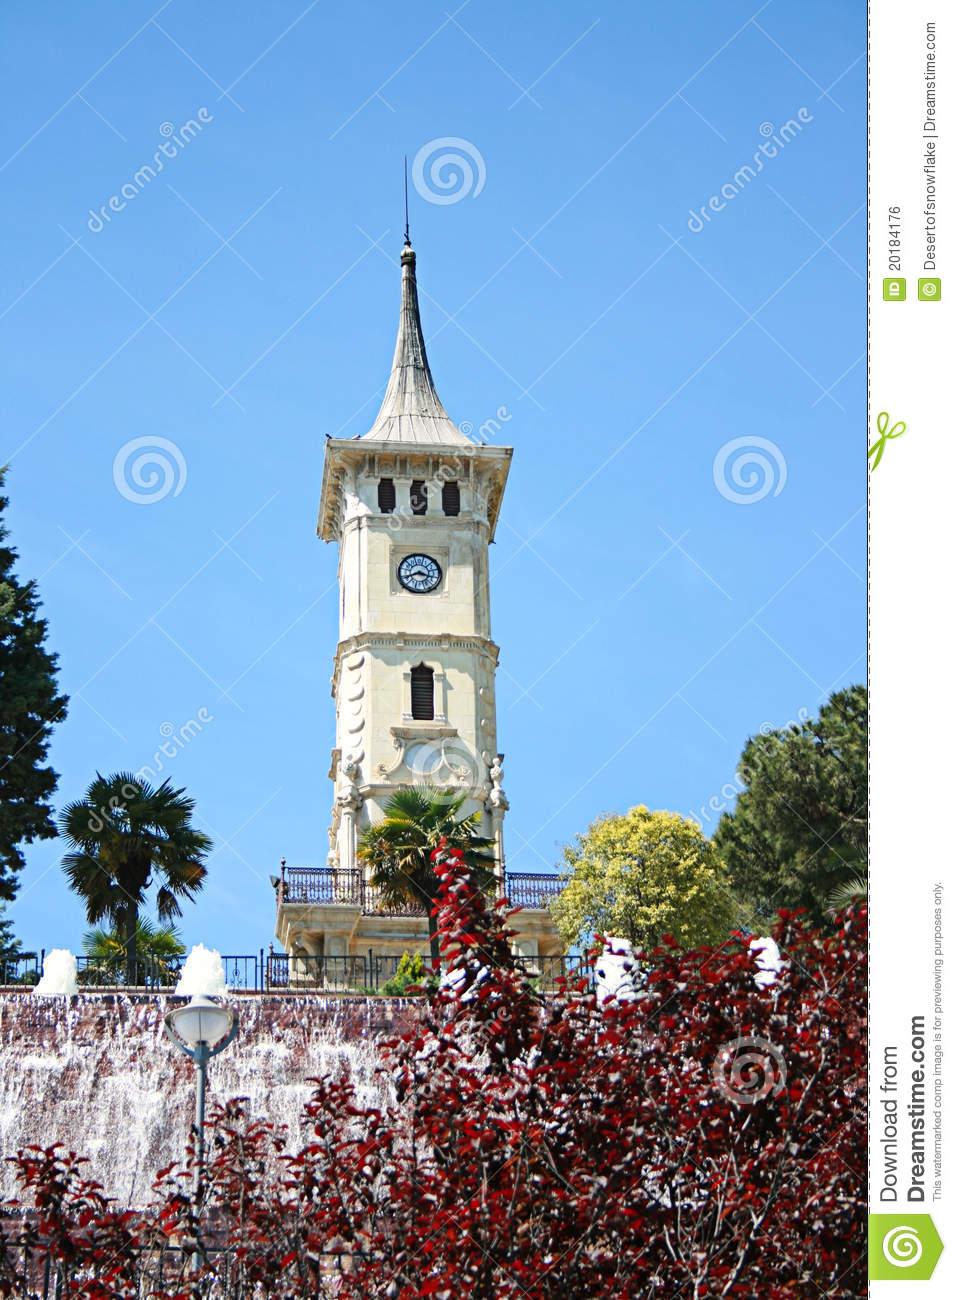 The Izmit Clock Tower,Symbol Of Izmit City Royalty Free Stock.